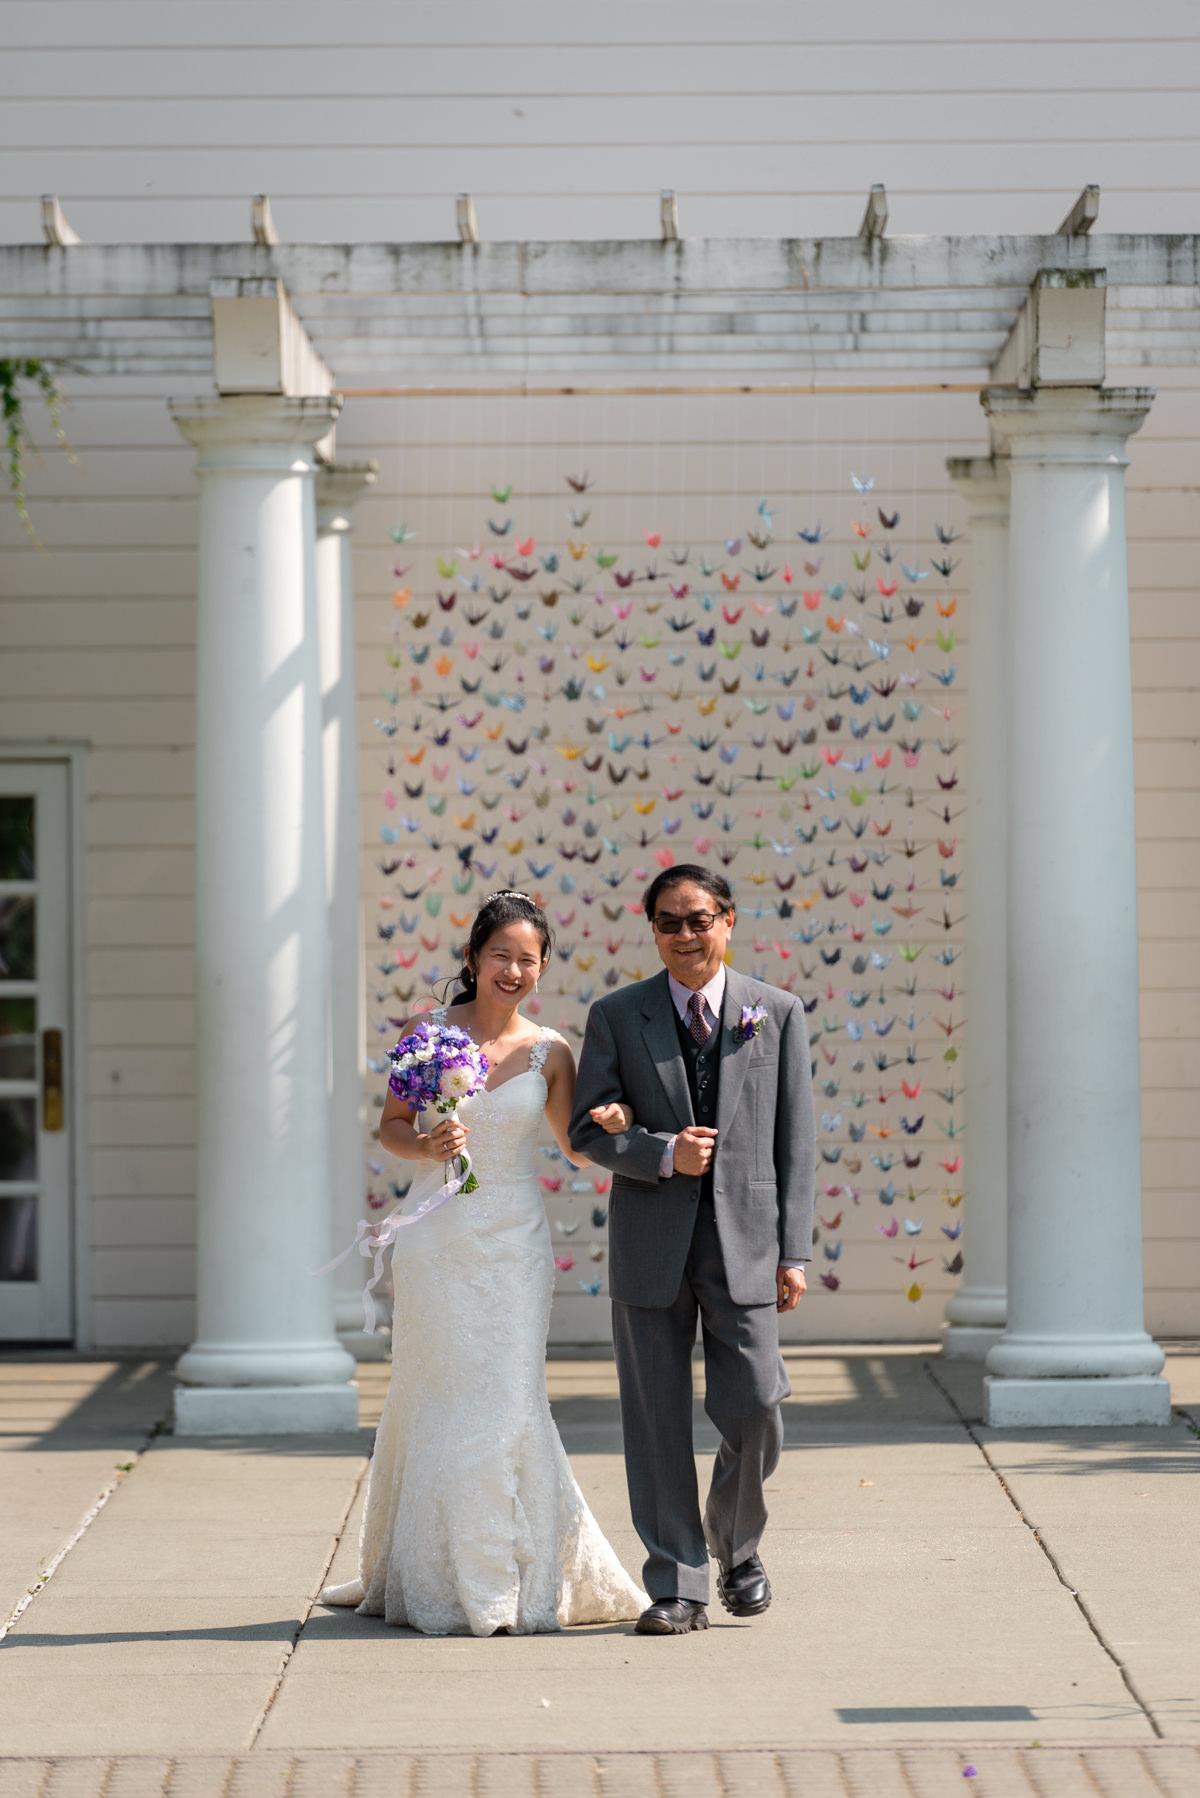 Andrew Tat - Documentary Wedding Photography - Heritage Hall - Kirkland, Washington - Grace & James - 42.JPG